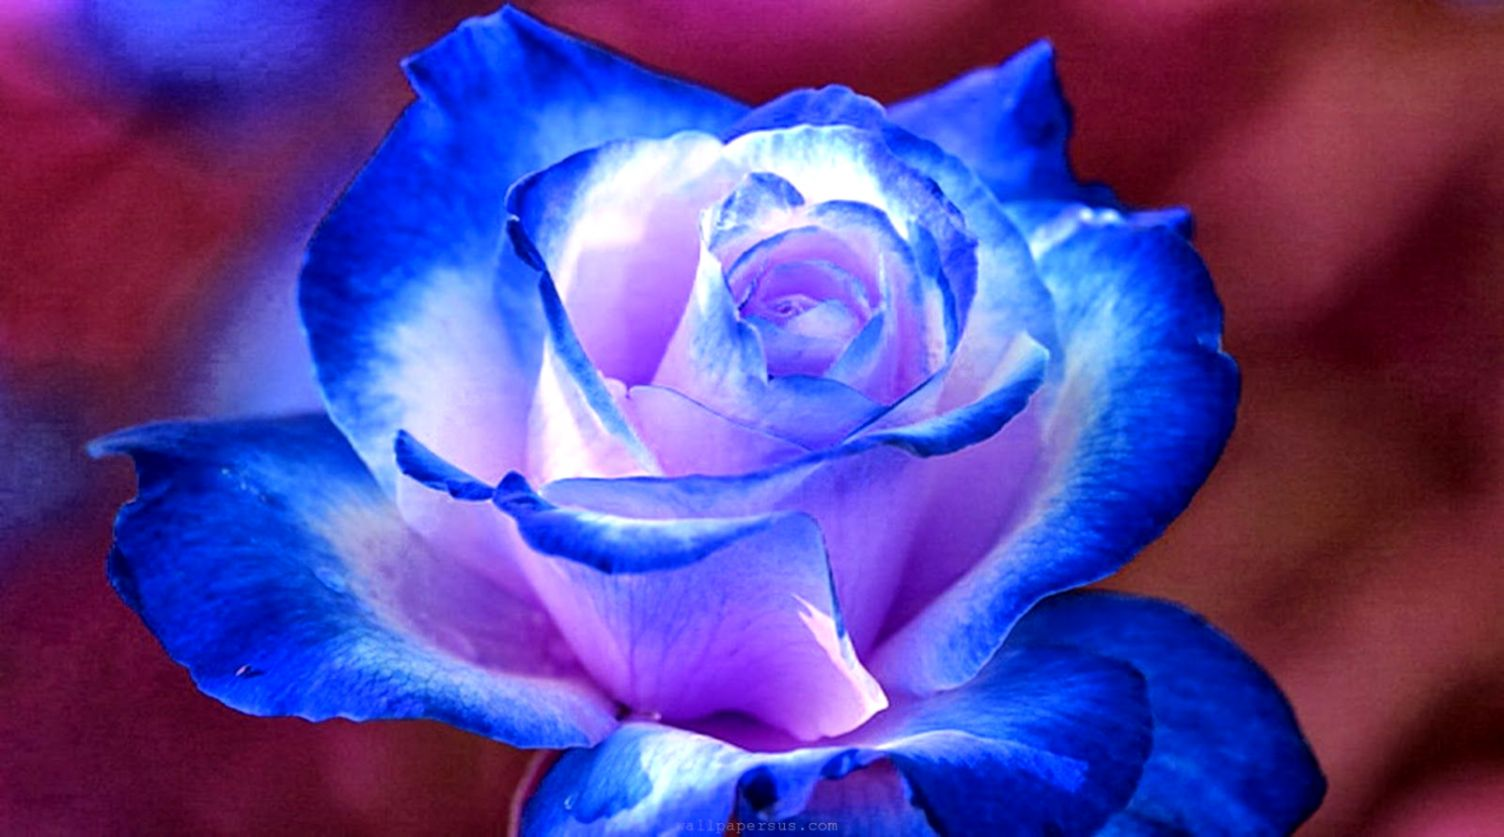 Hd Wallpapers Desktop Blue Flower Hd Wallpapers Sweet - Beautiful Blue And Purple Rose , HD Wallpaper & Backgrounds